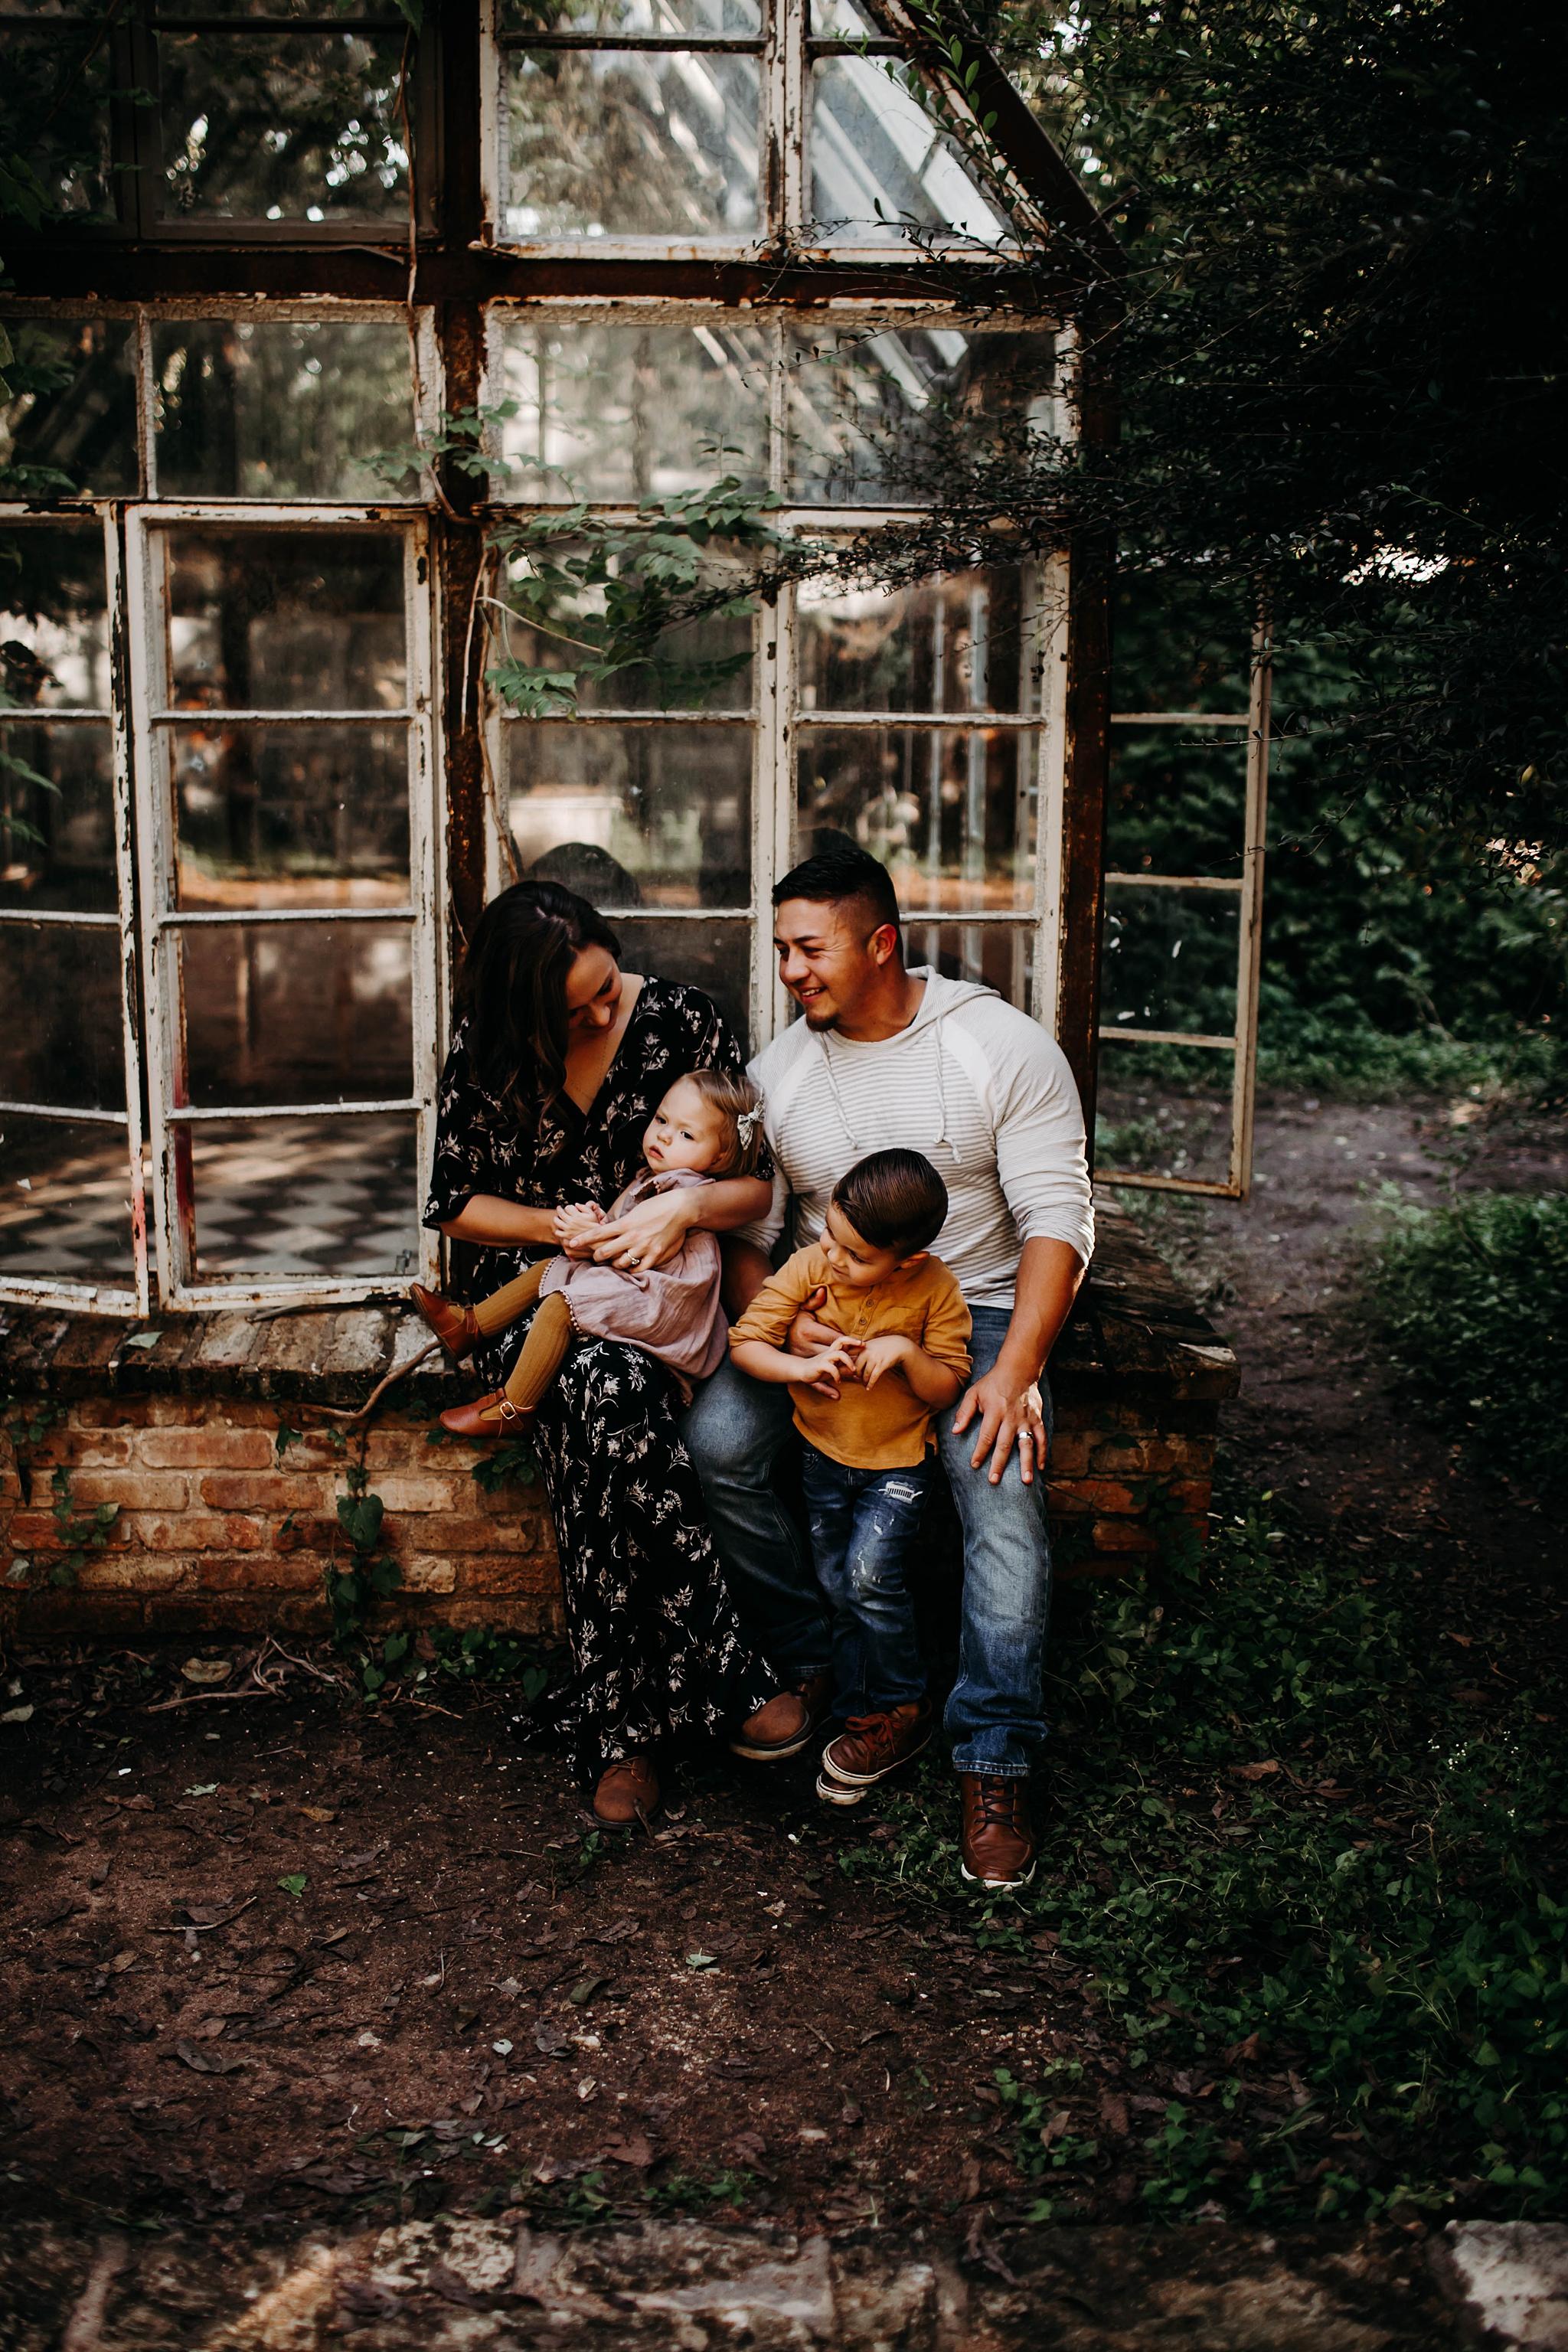 Luera-VMP-San-Antonio-Family-Photography-121_WEB.jpg